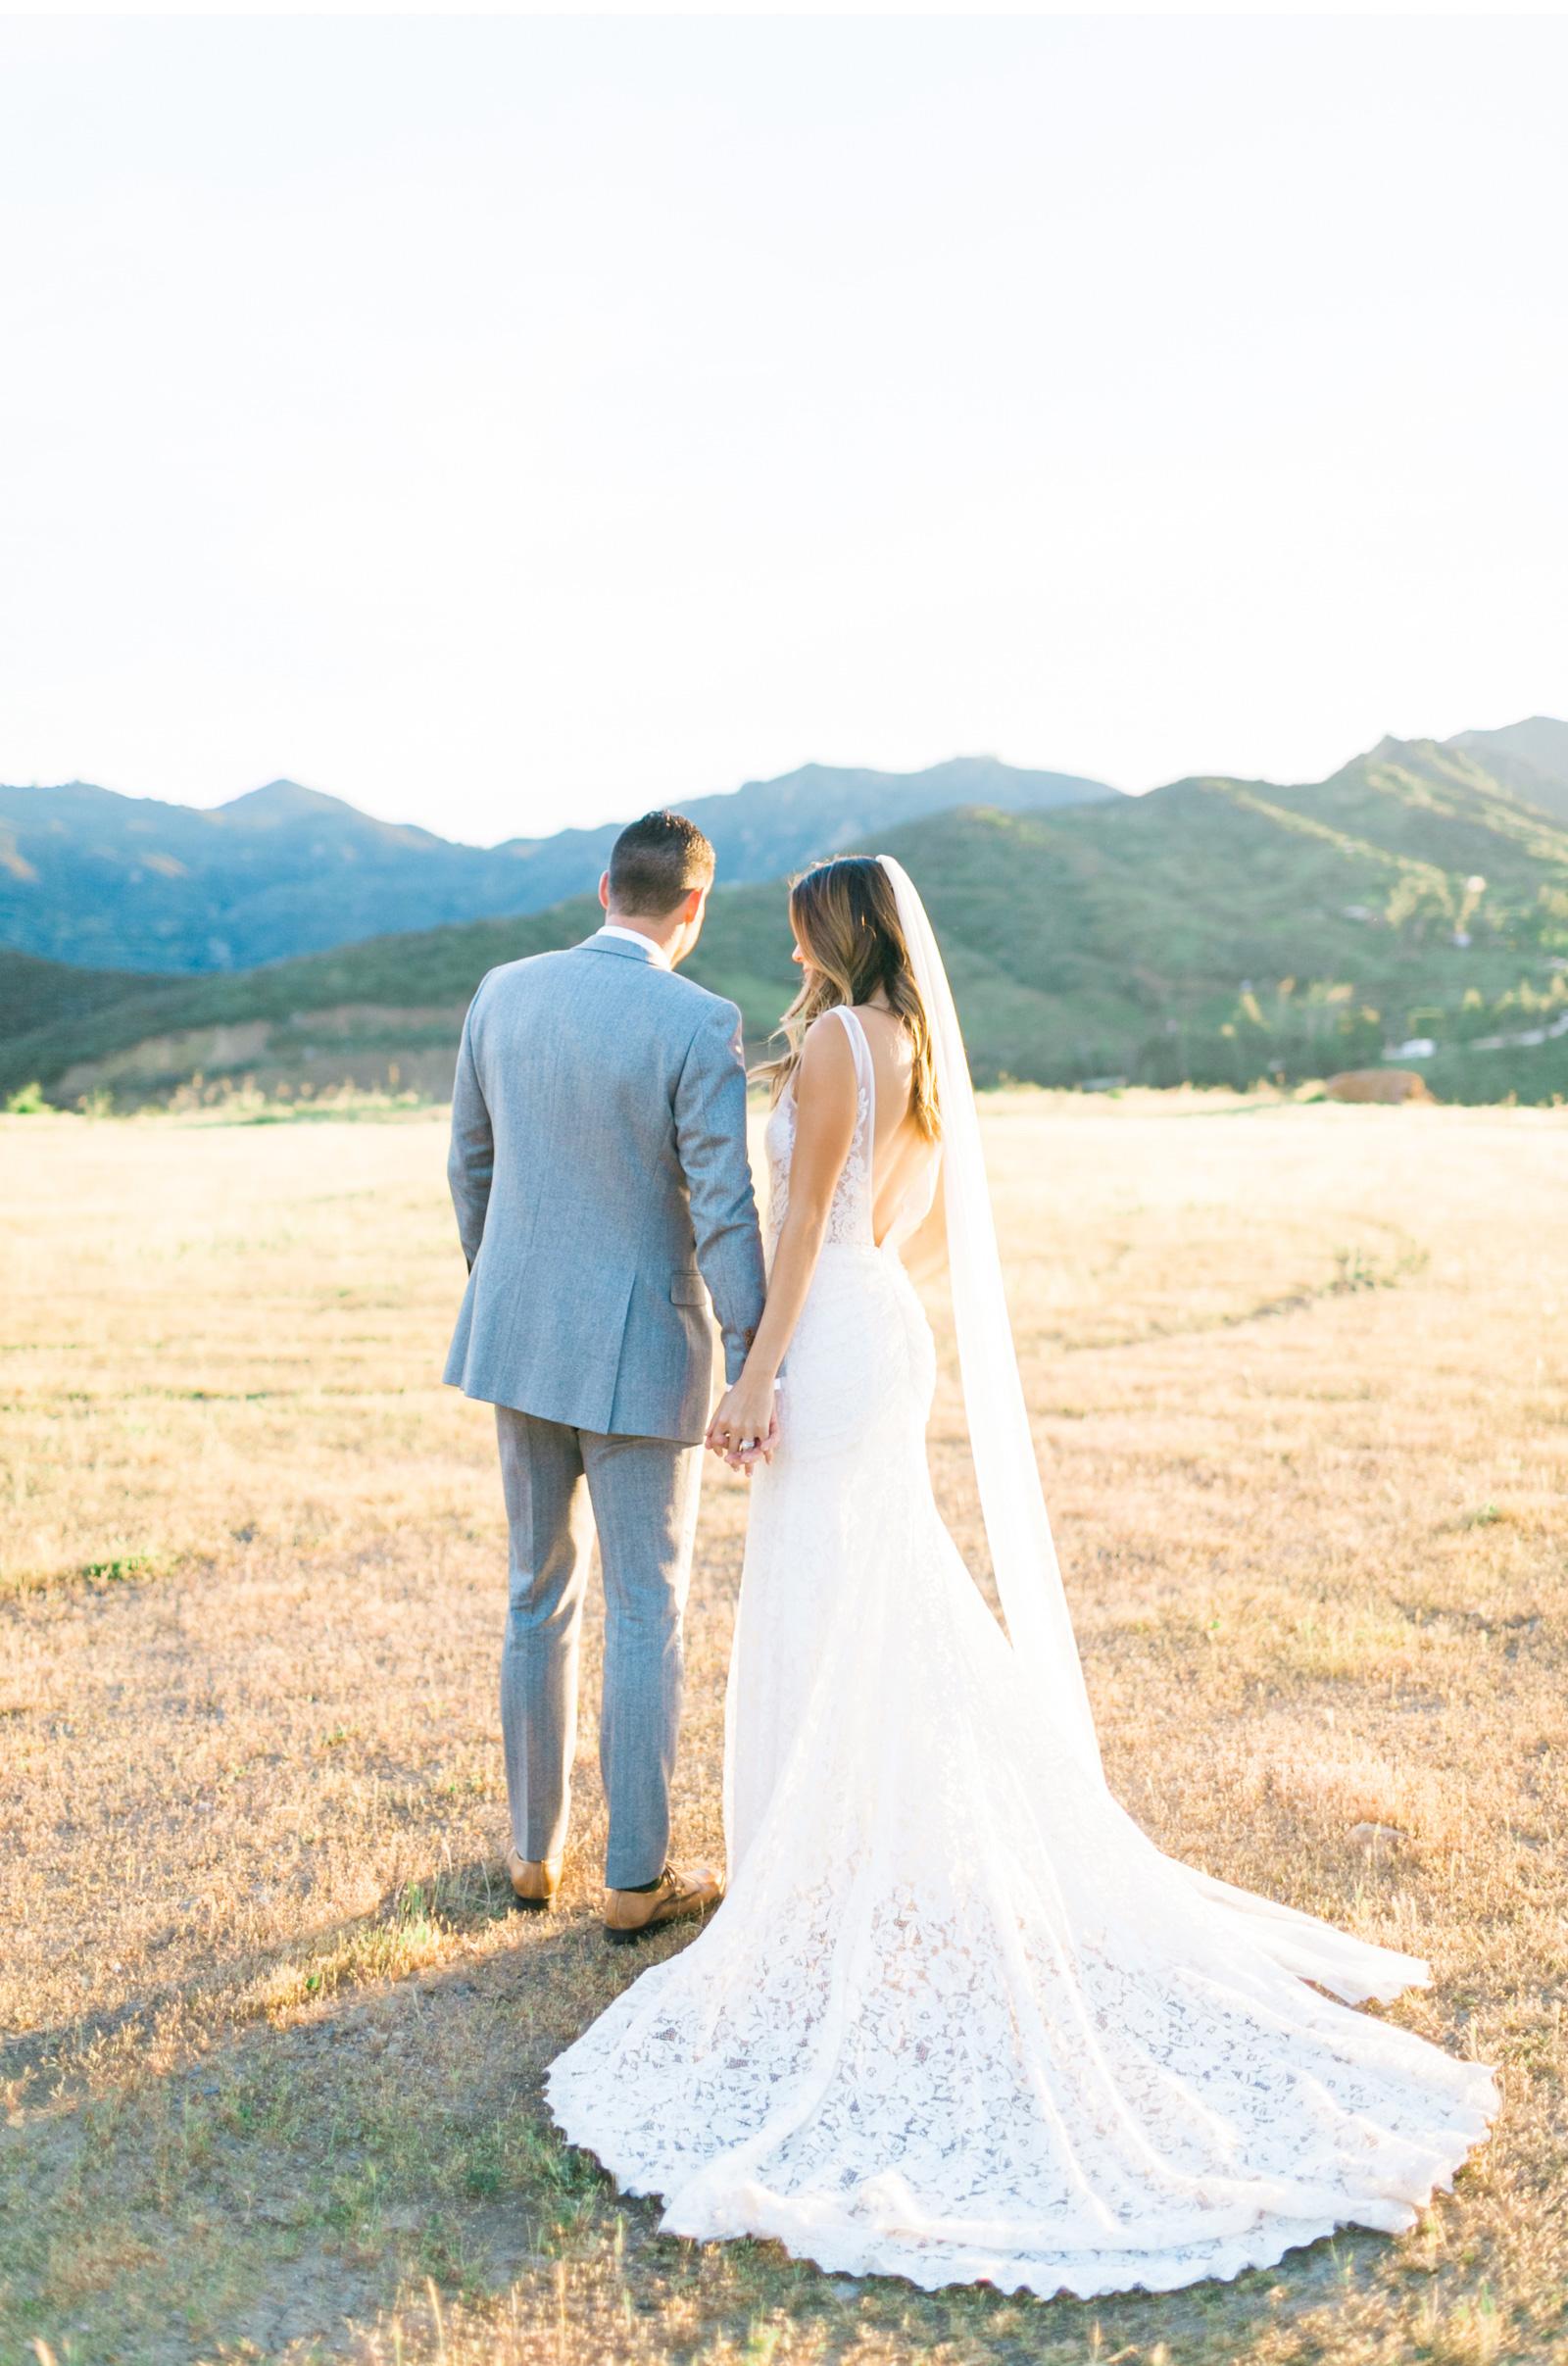 Triunfo-Creek-Malibu-Wedding-Natalie-Schutt-Photography-Couture-Events-Style-Me-Pretty_04.jpg